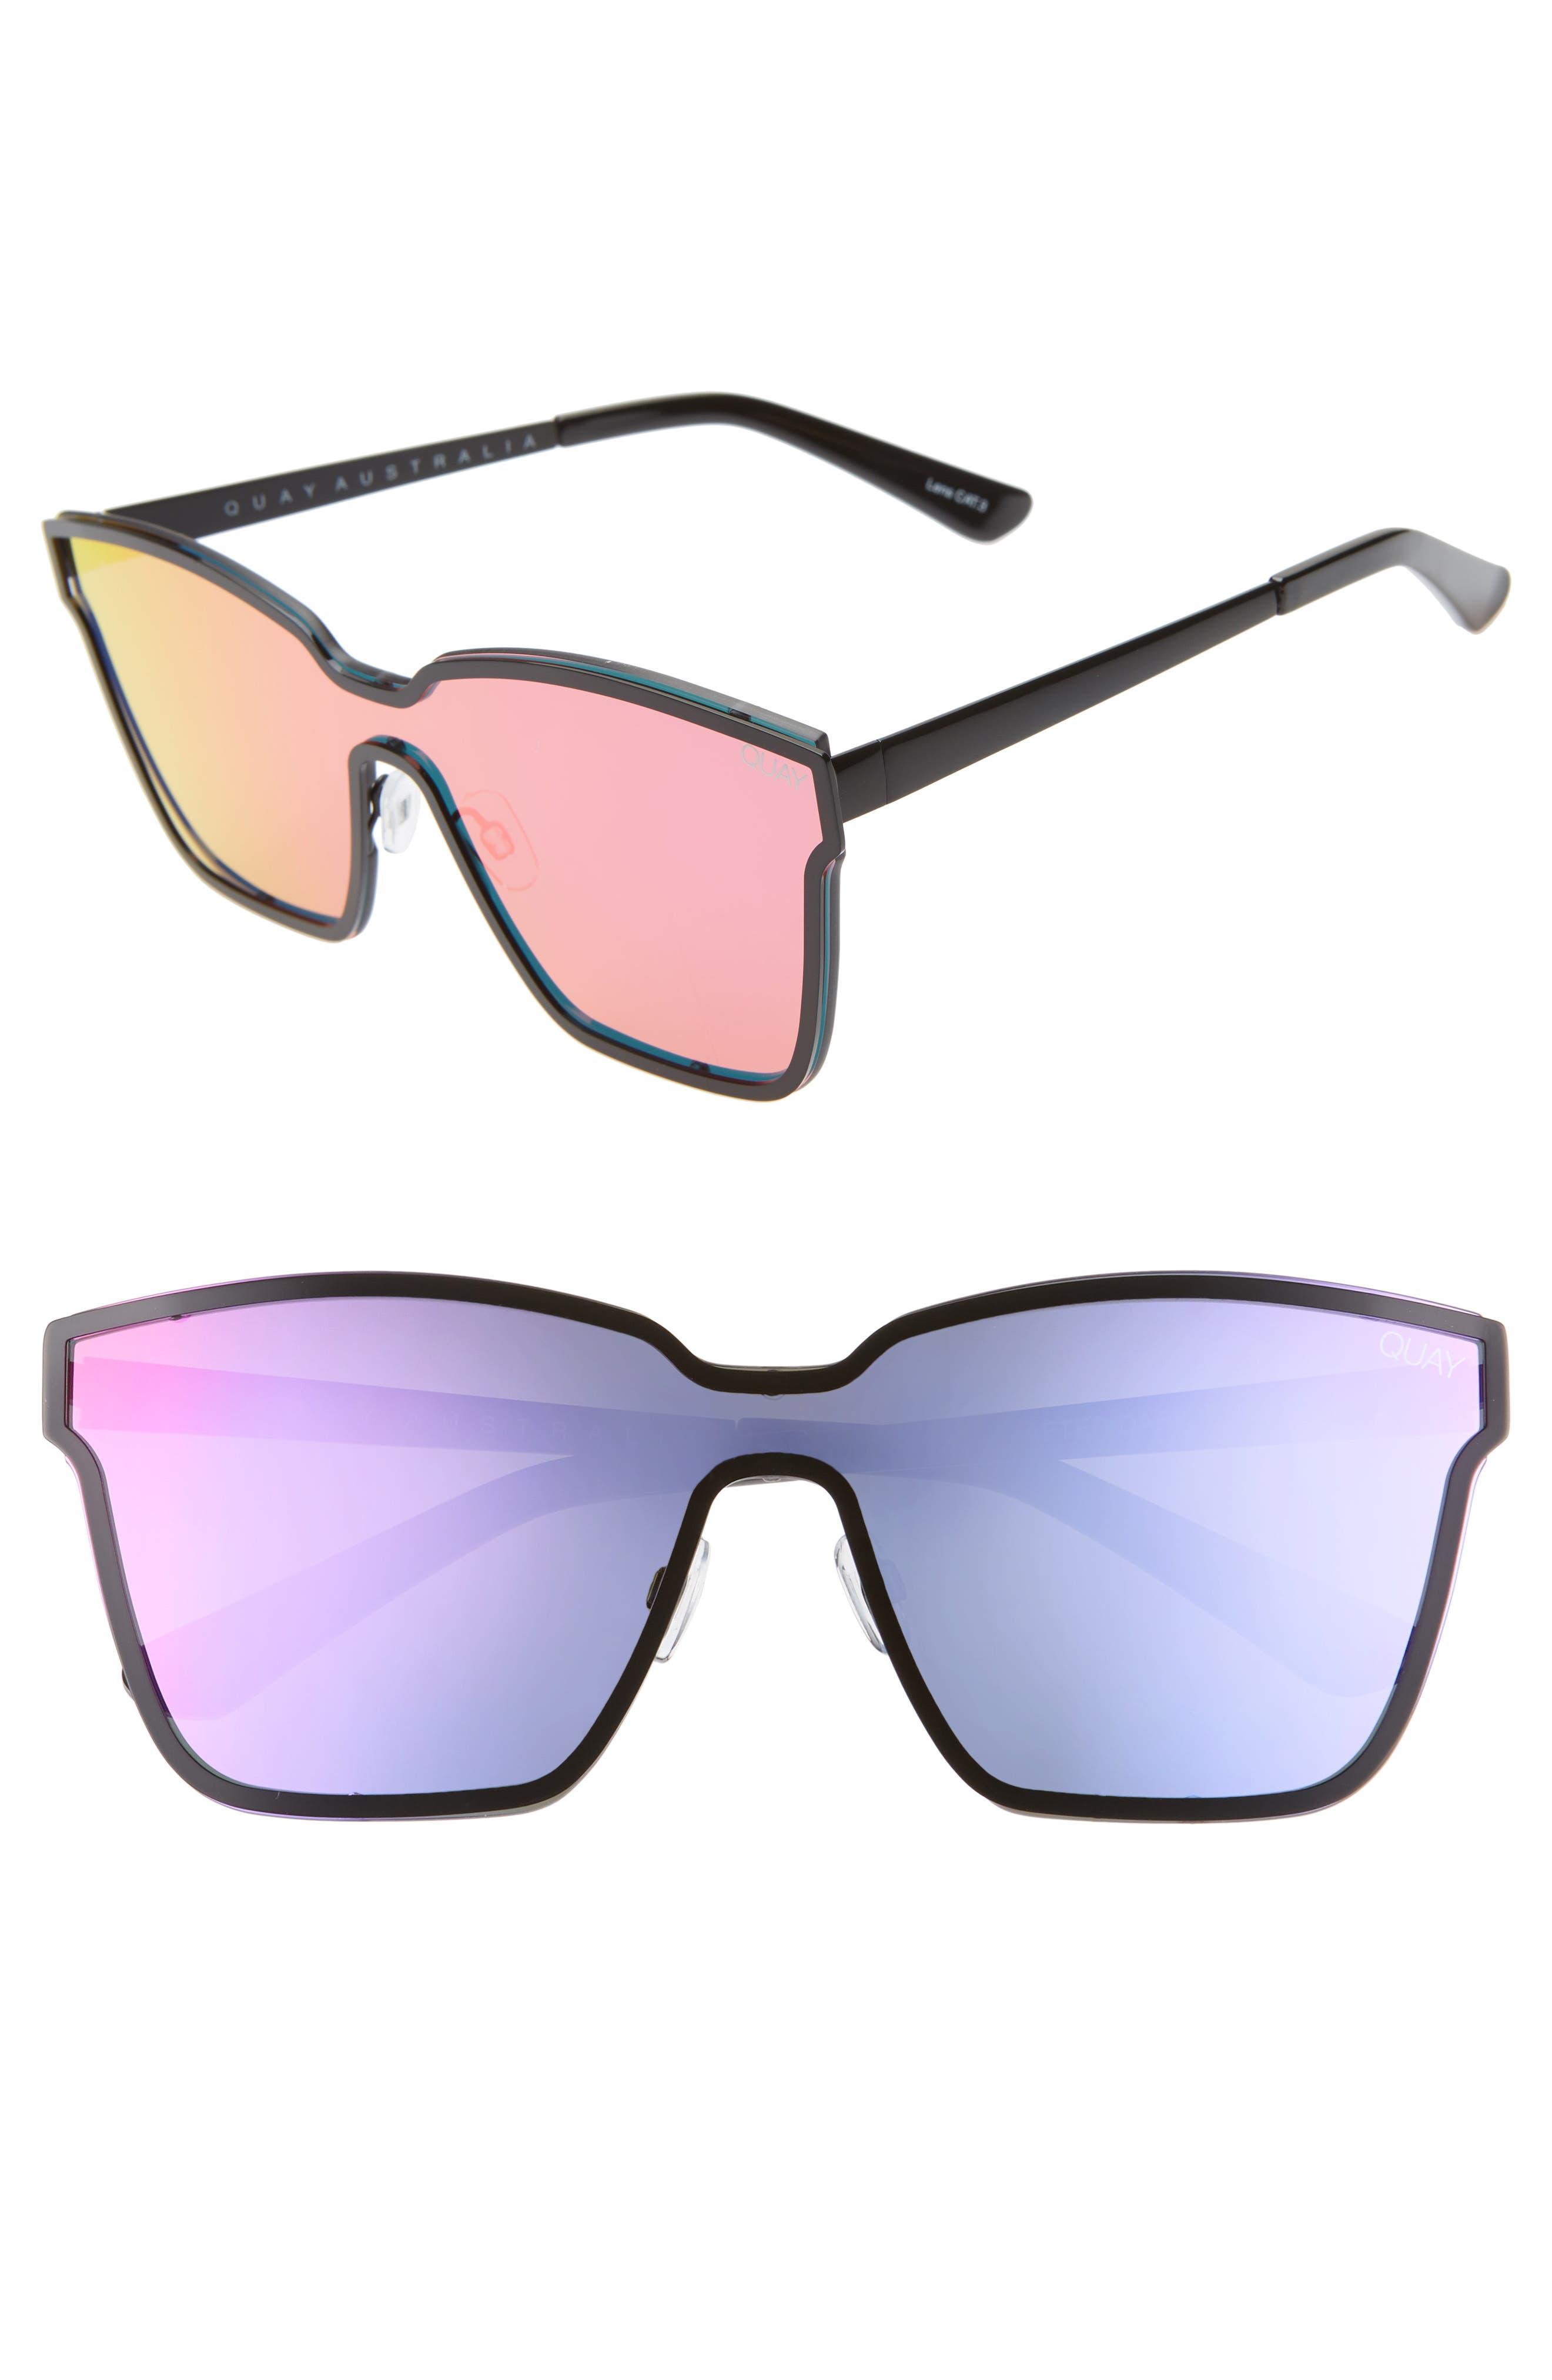 Quay Australia After Dark 14m Shield Sunglasses - Black/ Purple/ Pink